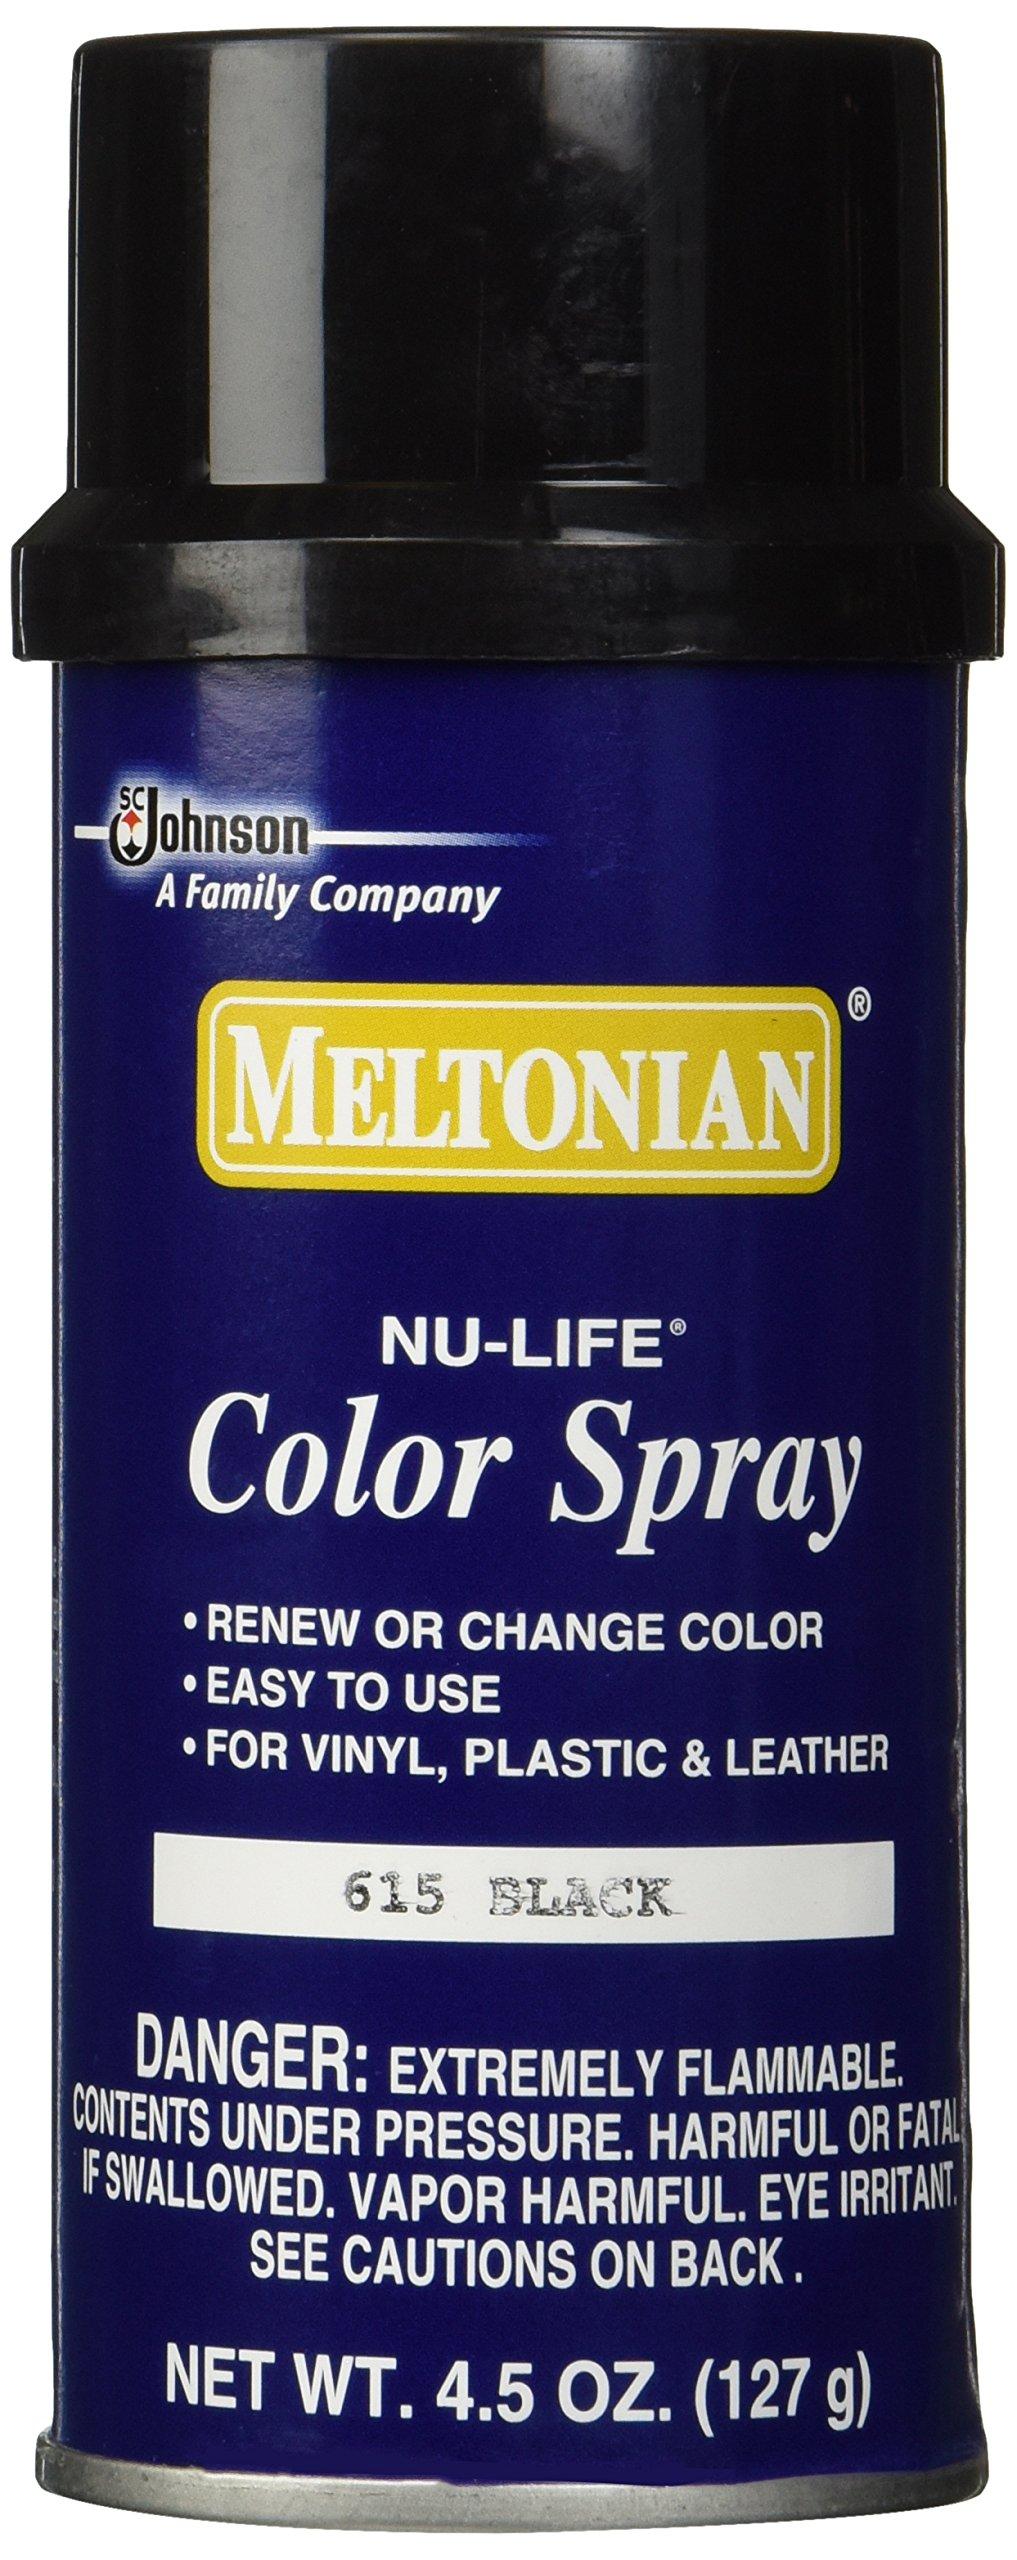 Meltonian Shoe Color Spray - 615 Black